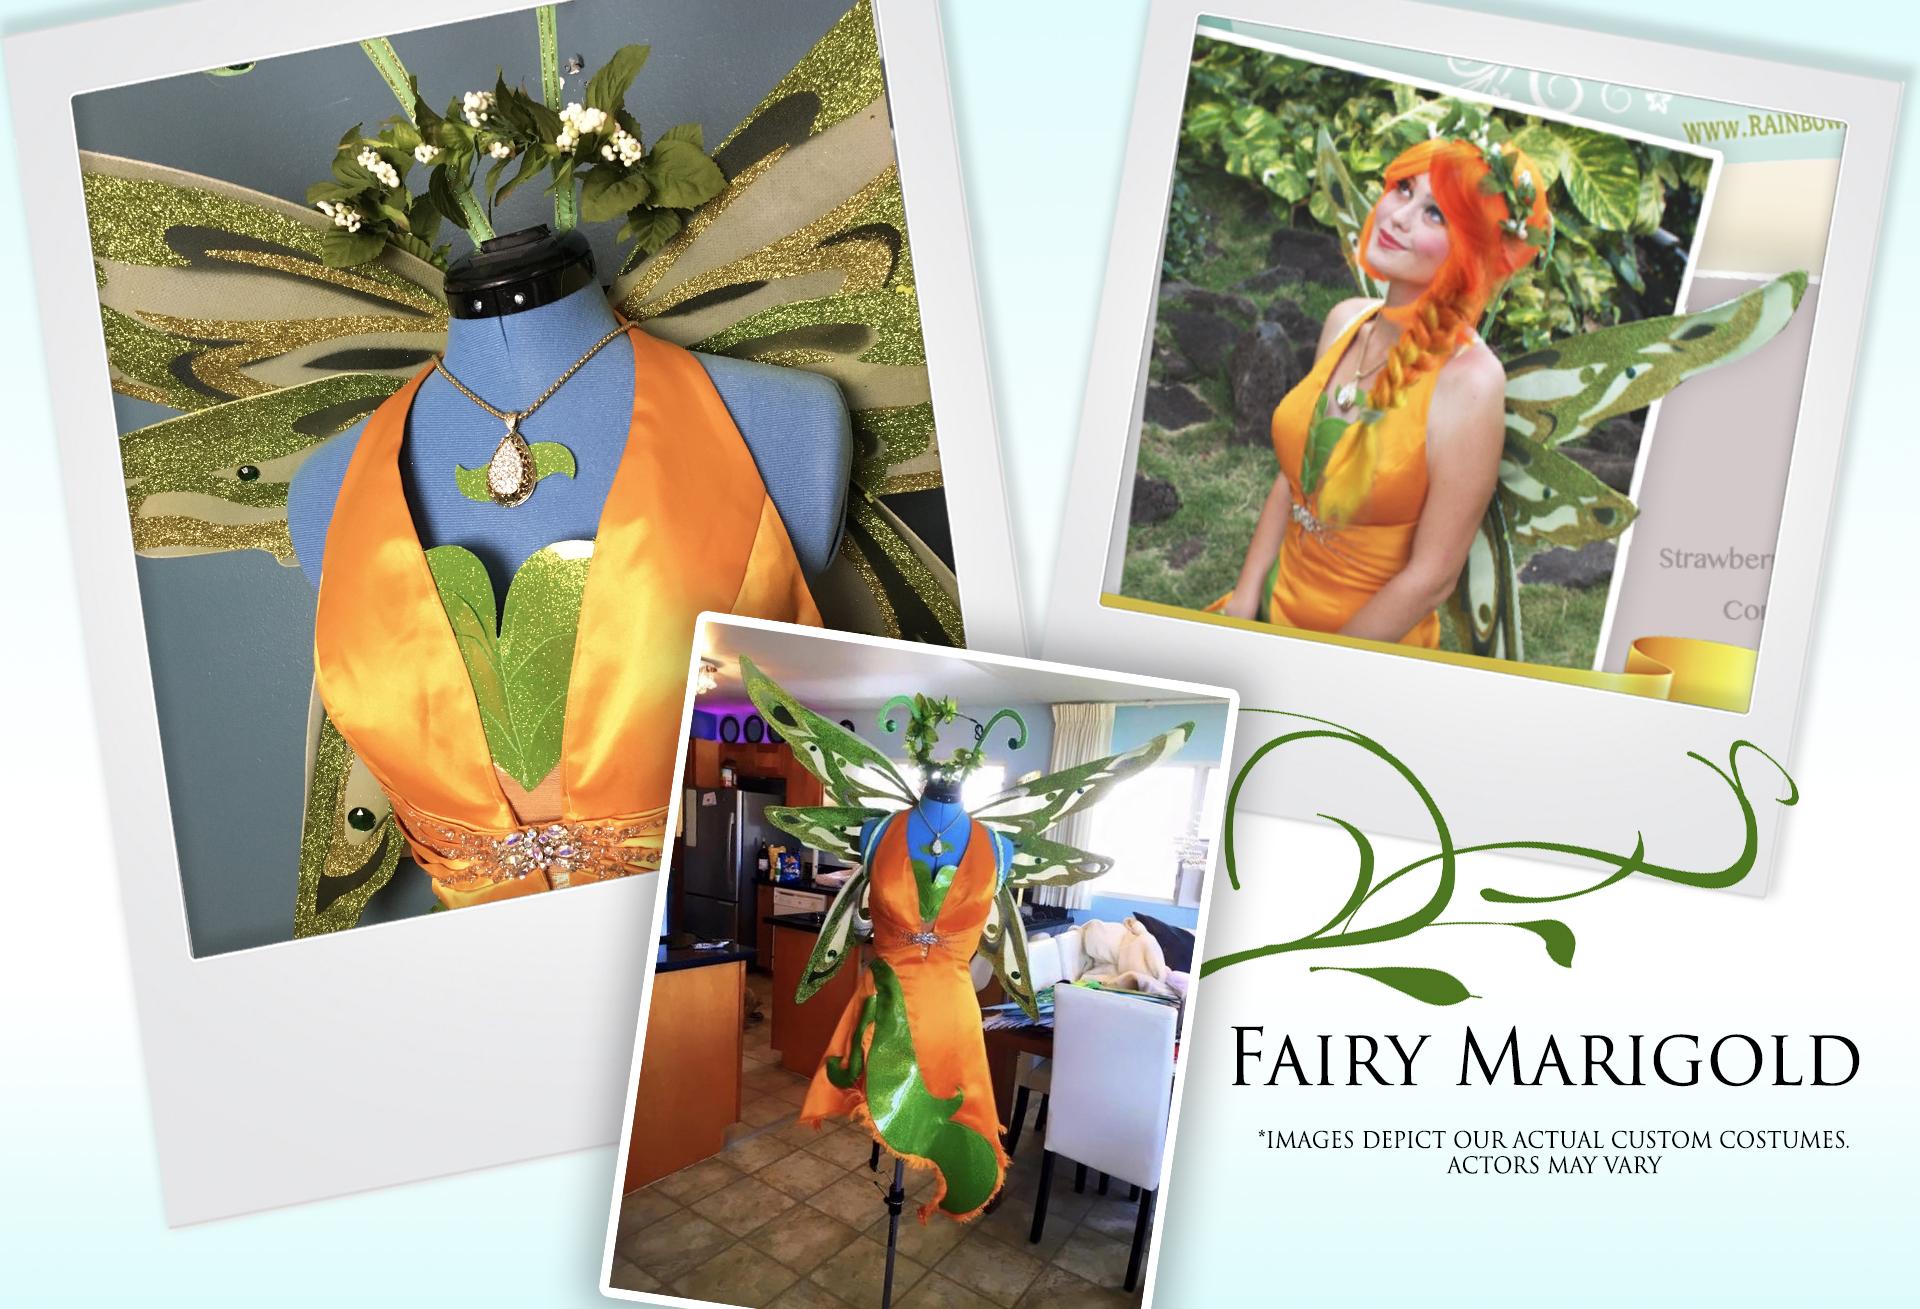 Fairy Marigold